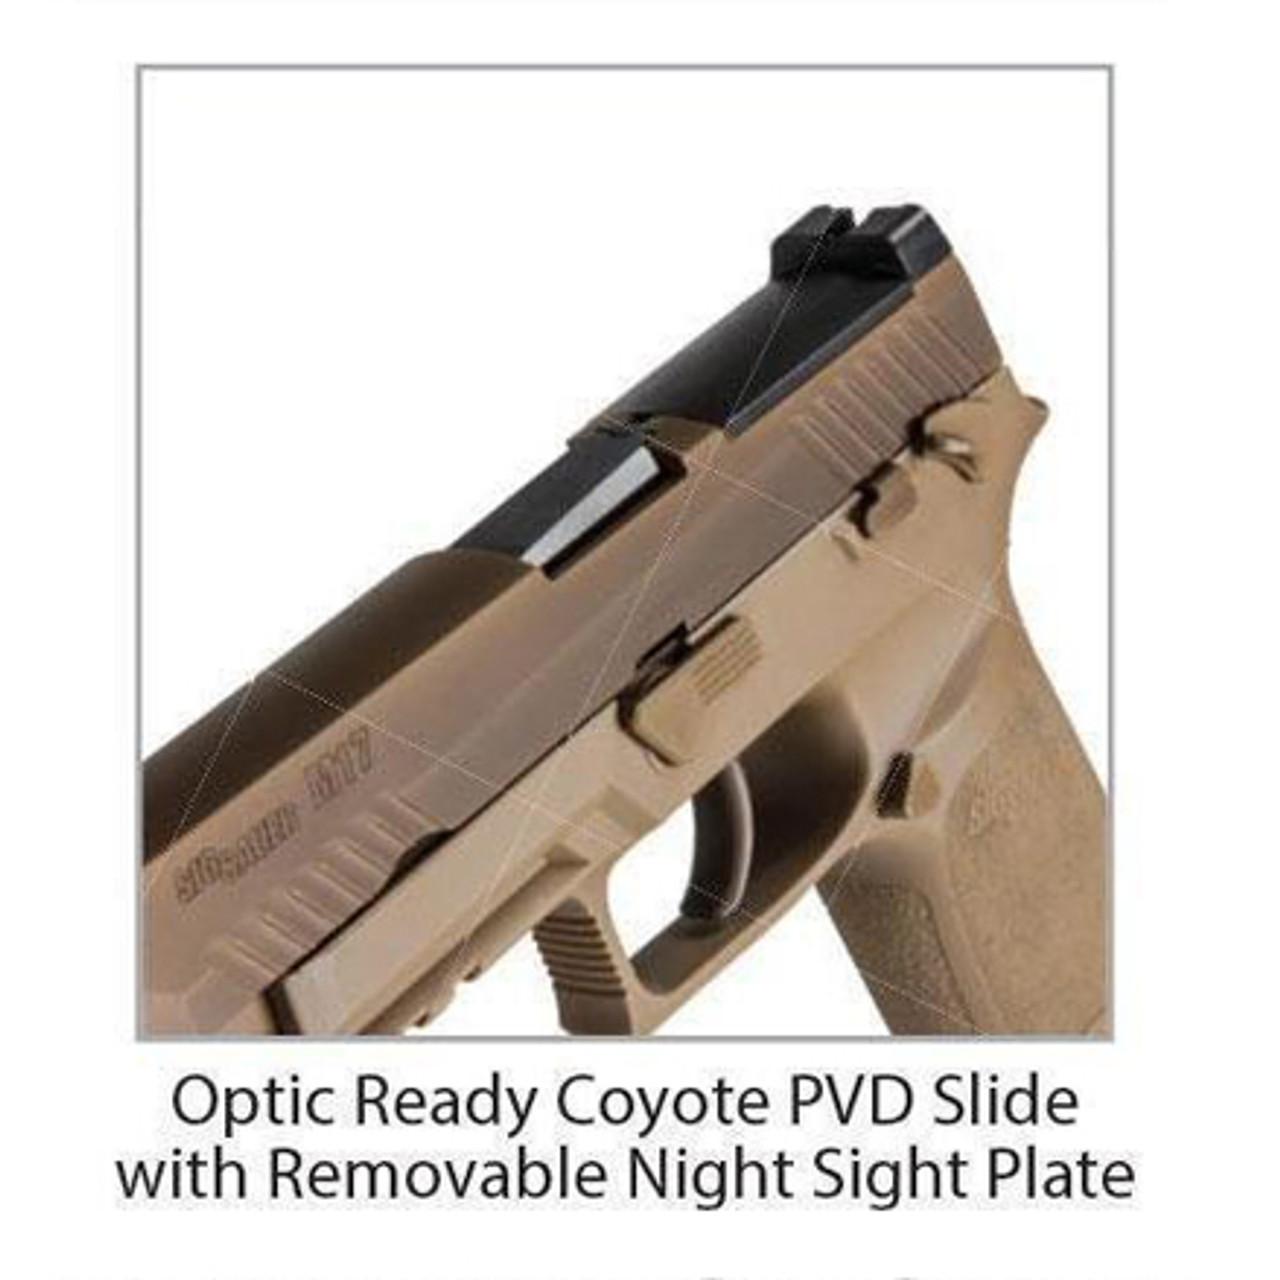 Sig Sauer P320 M17 Commemorative 9mm military pistol